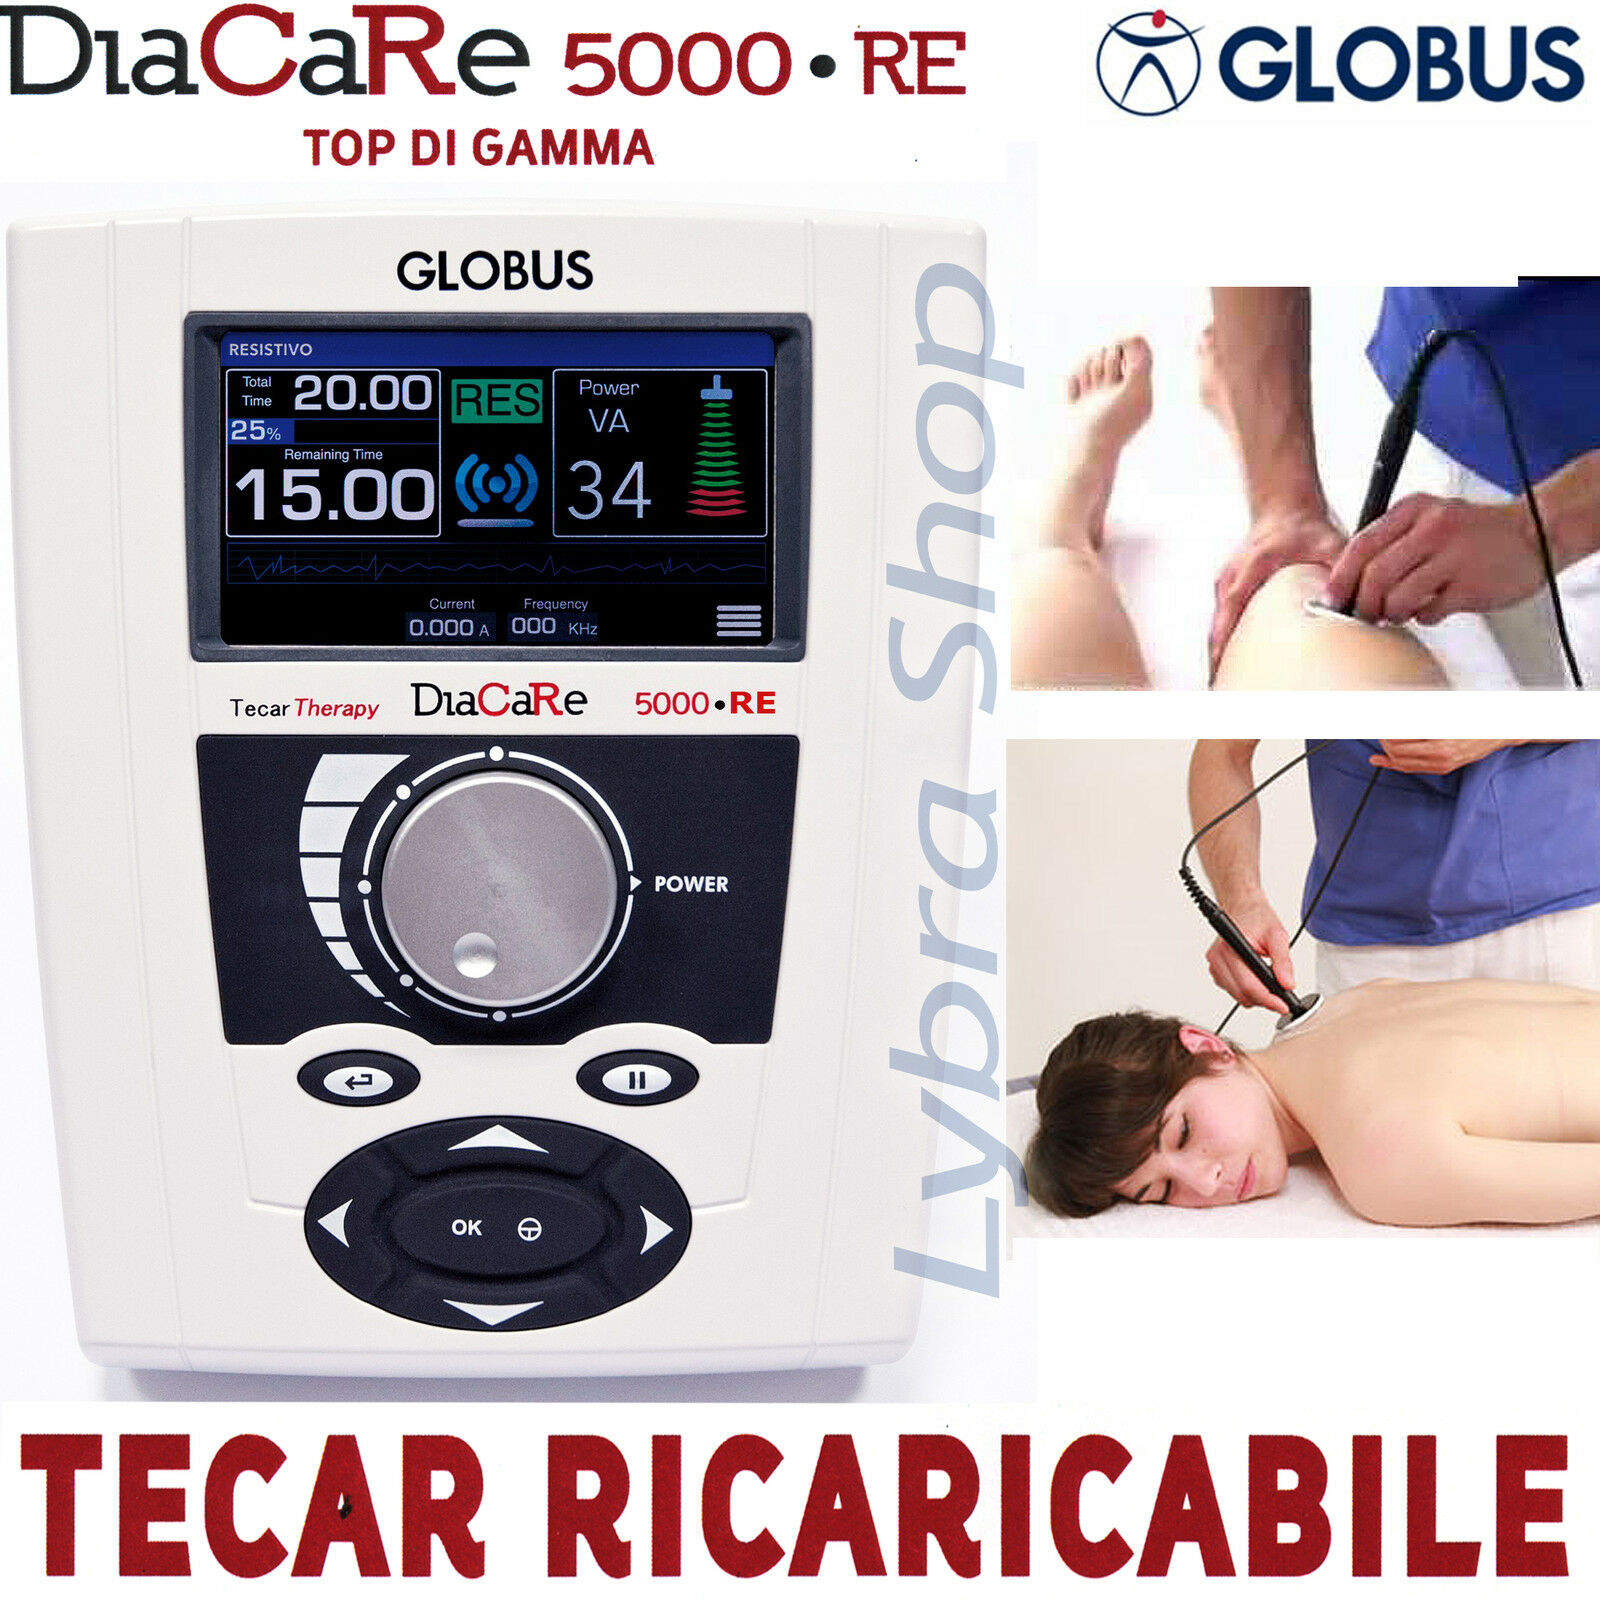 Globus DIACARE 5000 RE RICARICABILE RICARICABILE RICARICABILE 300 Minuti Inclusi PROFESS. Tecar diatermia 979257